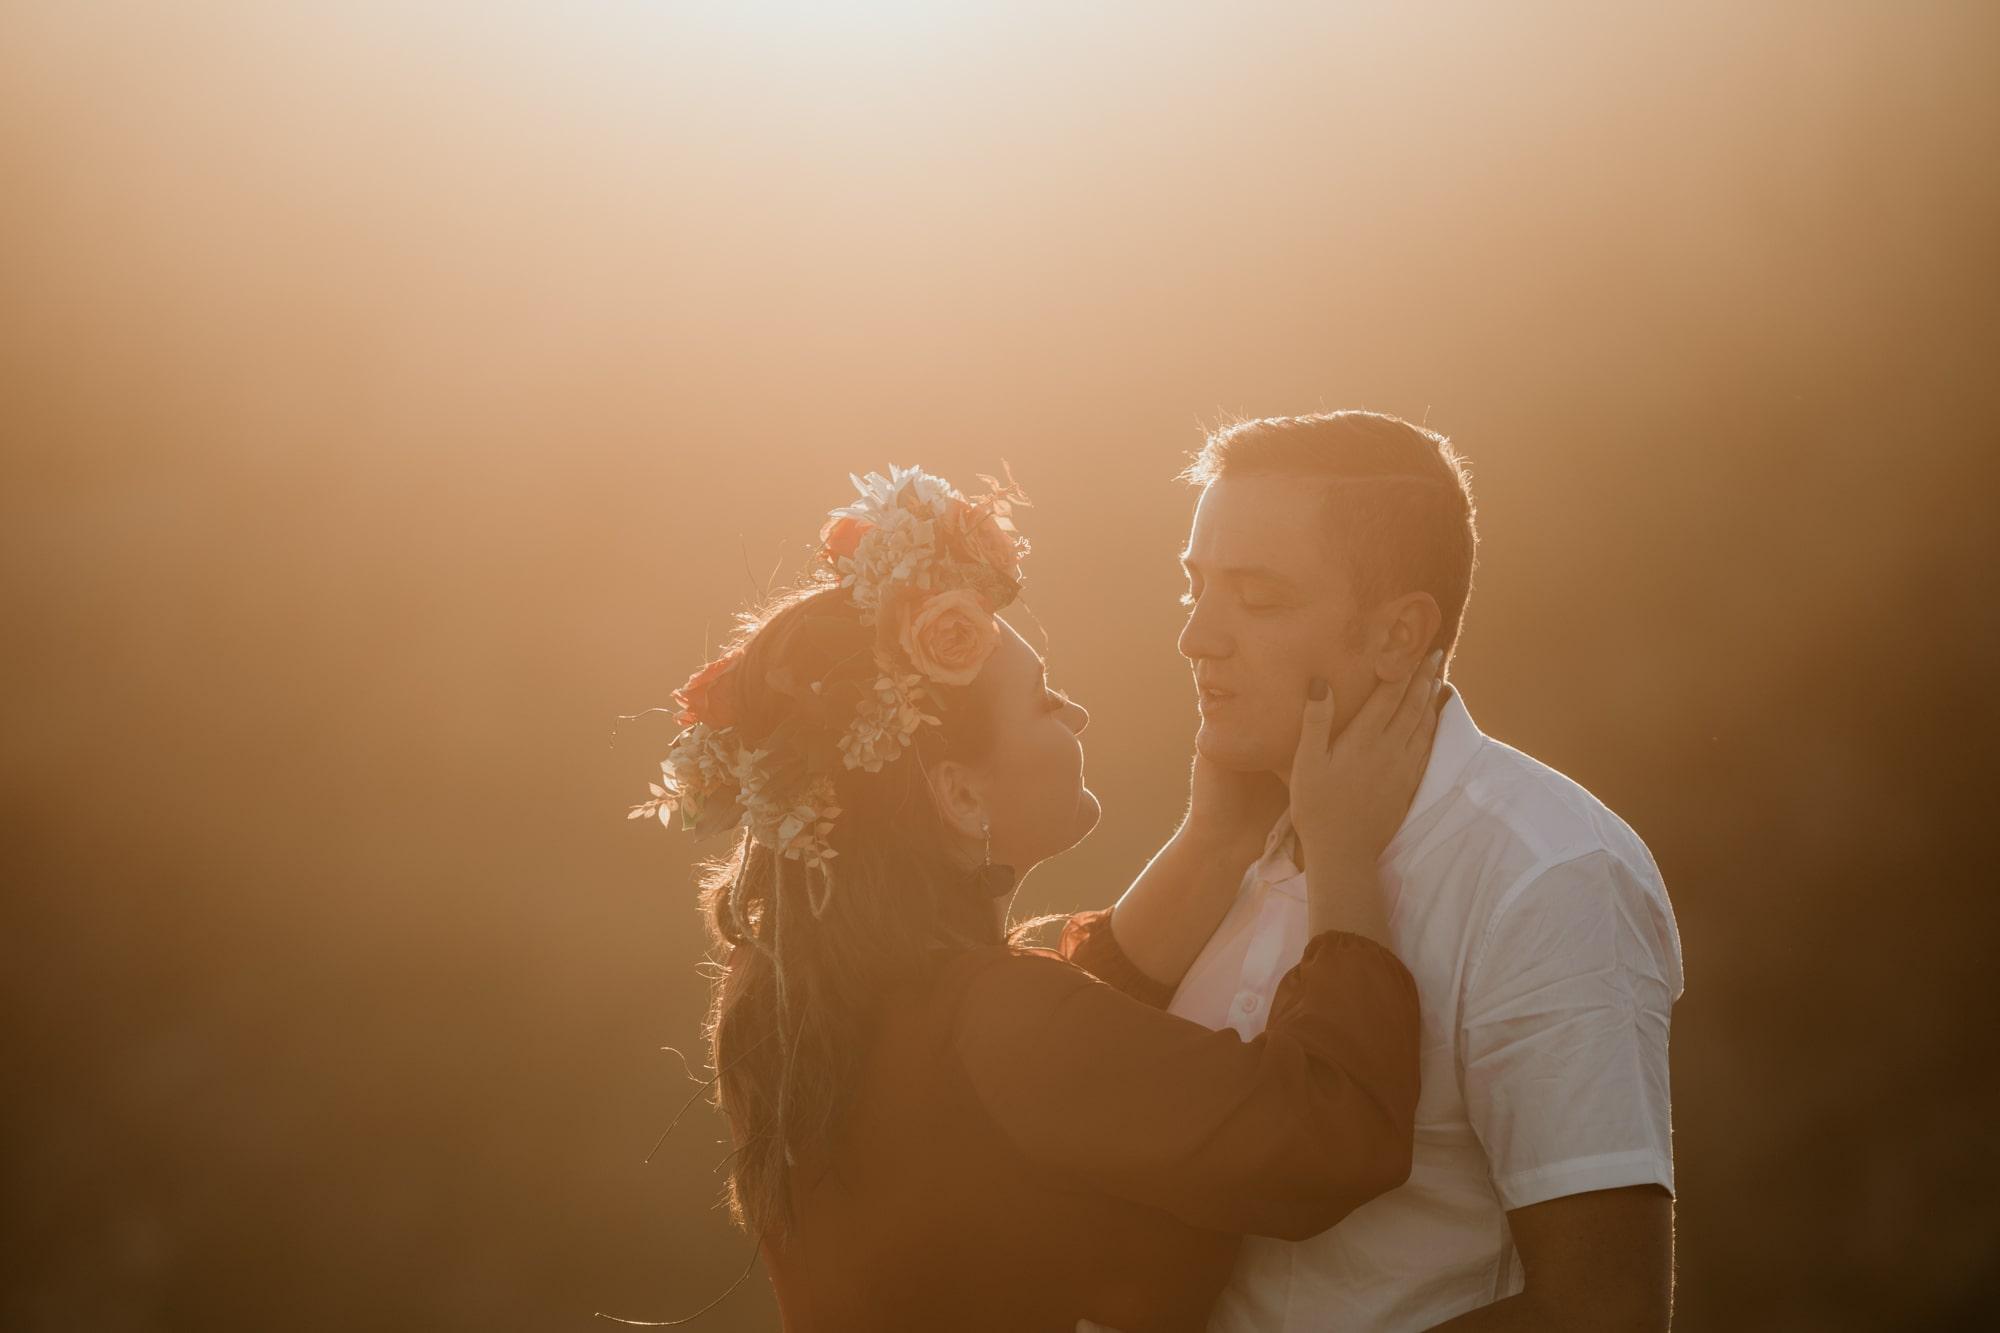 jesann-freddie-kranshoek-engagement-June-Richards-Photography-Destination-Weddings-Elopements-Garden-Route-56